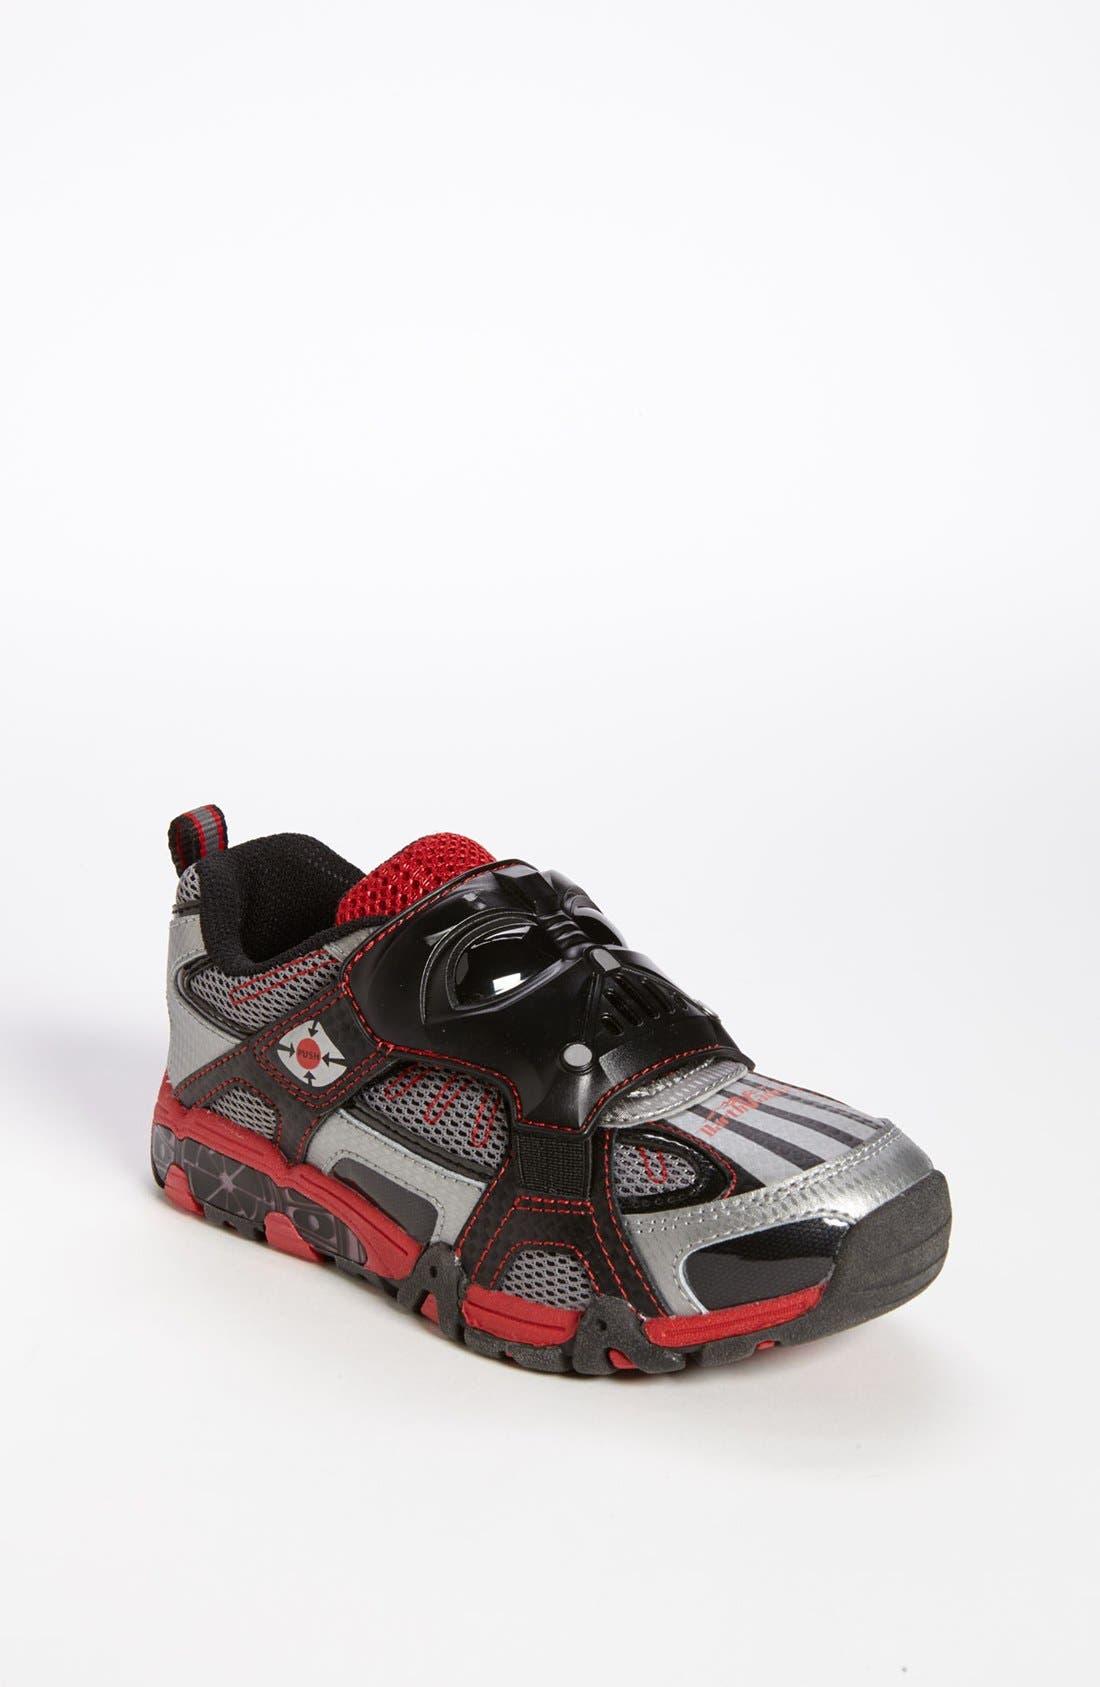 Alternate Image 1 Selected - Stride Rite 'Darth Vader™ - Light & Sound' Sneaker (Toddler & Little Kid)